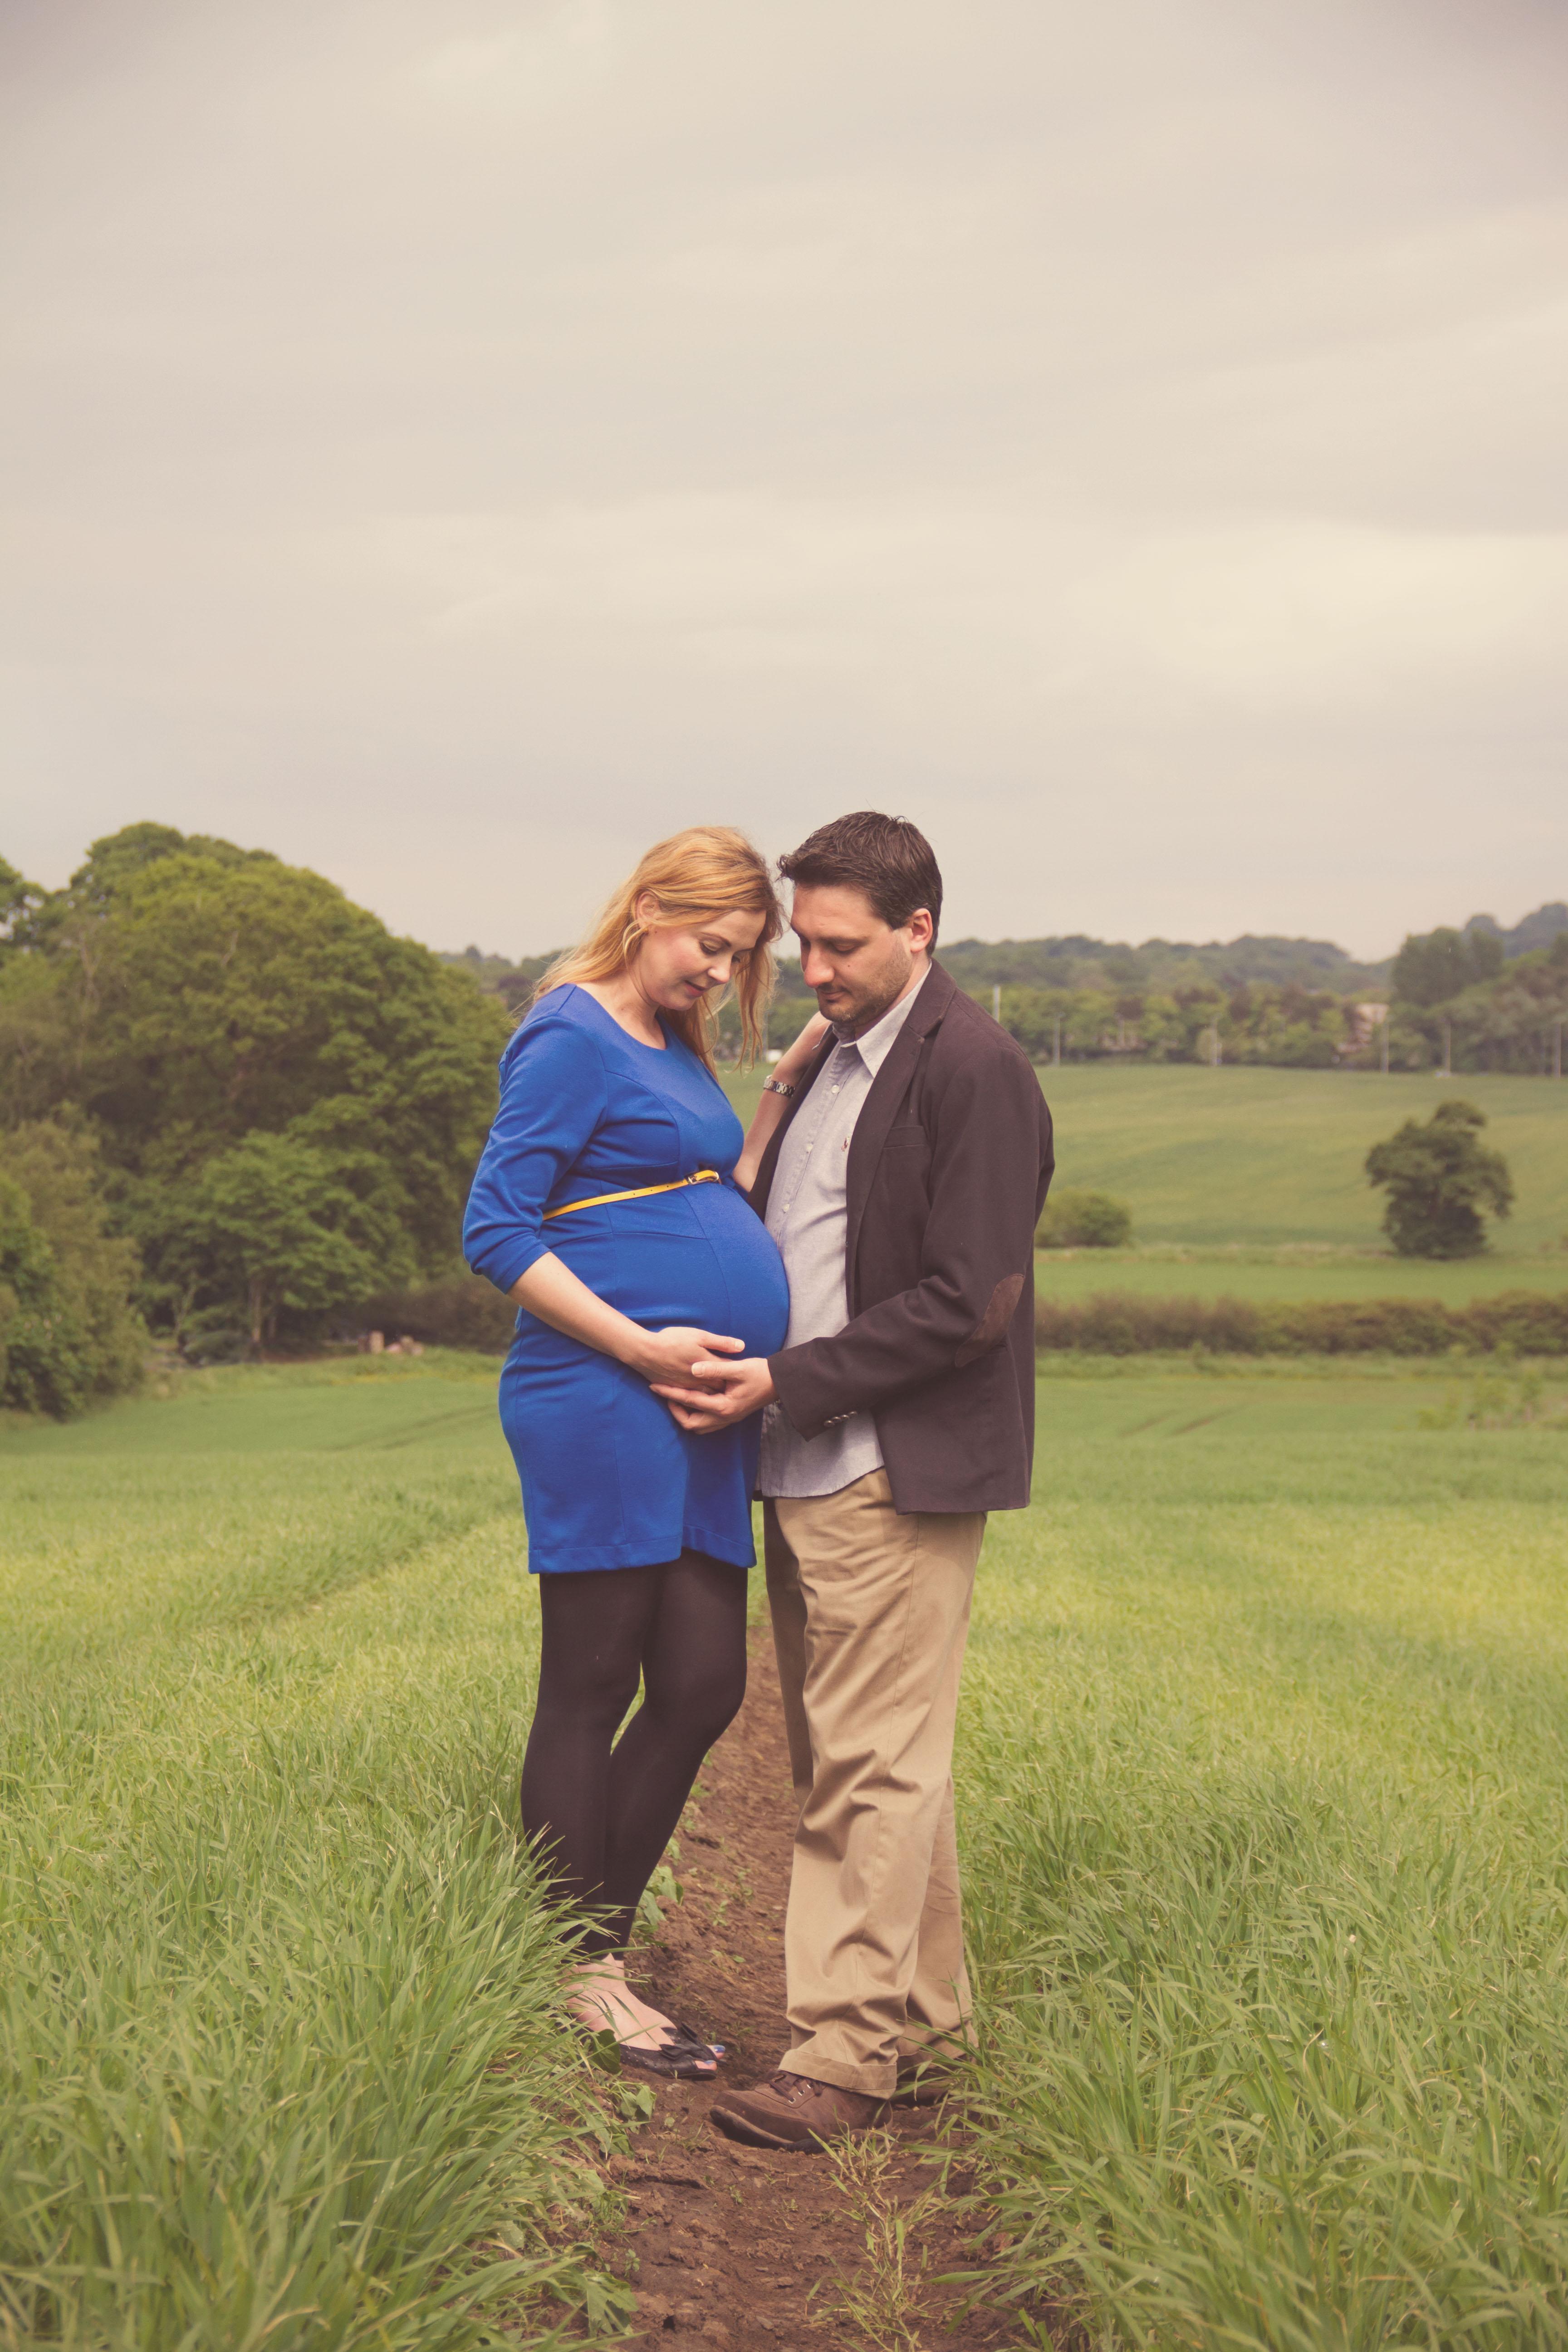 edinburgh maternity sessions